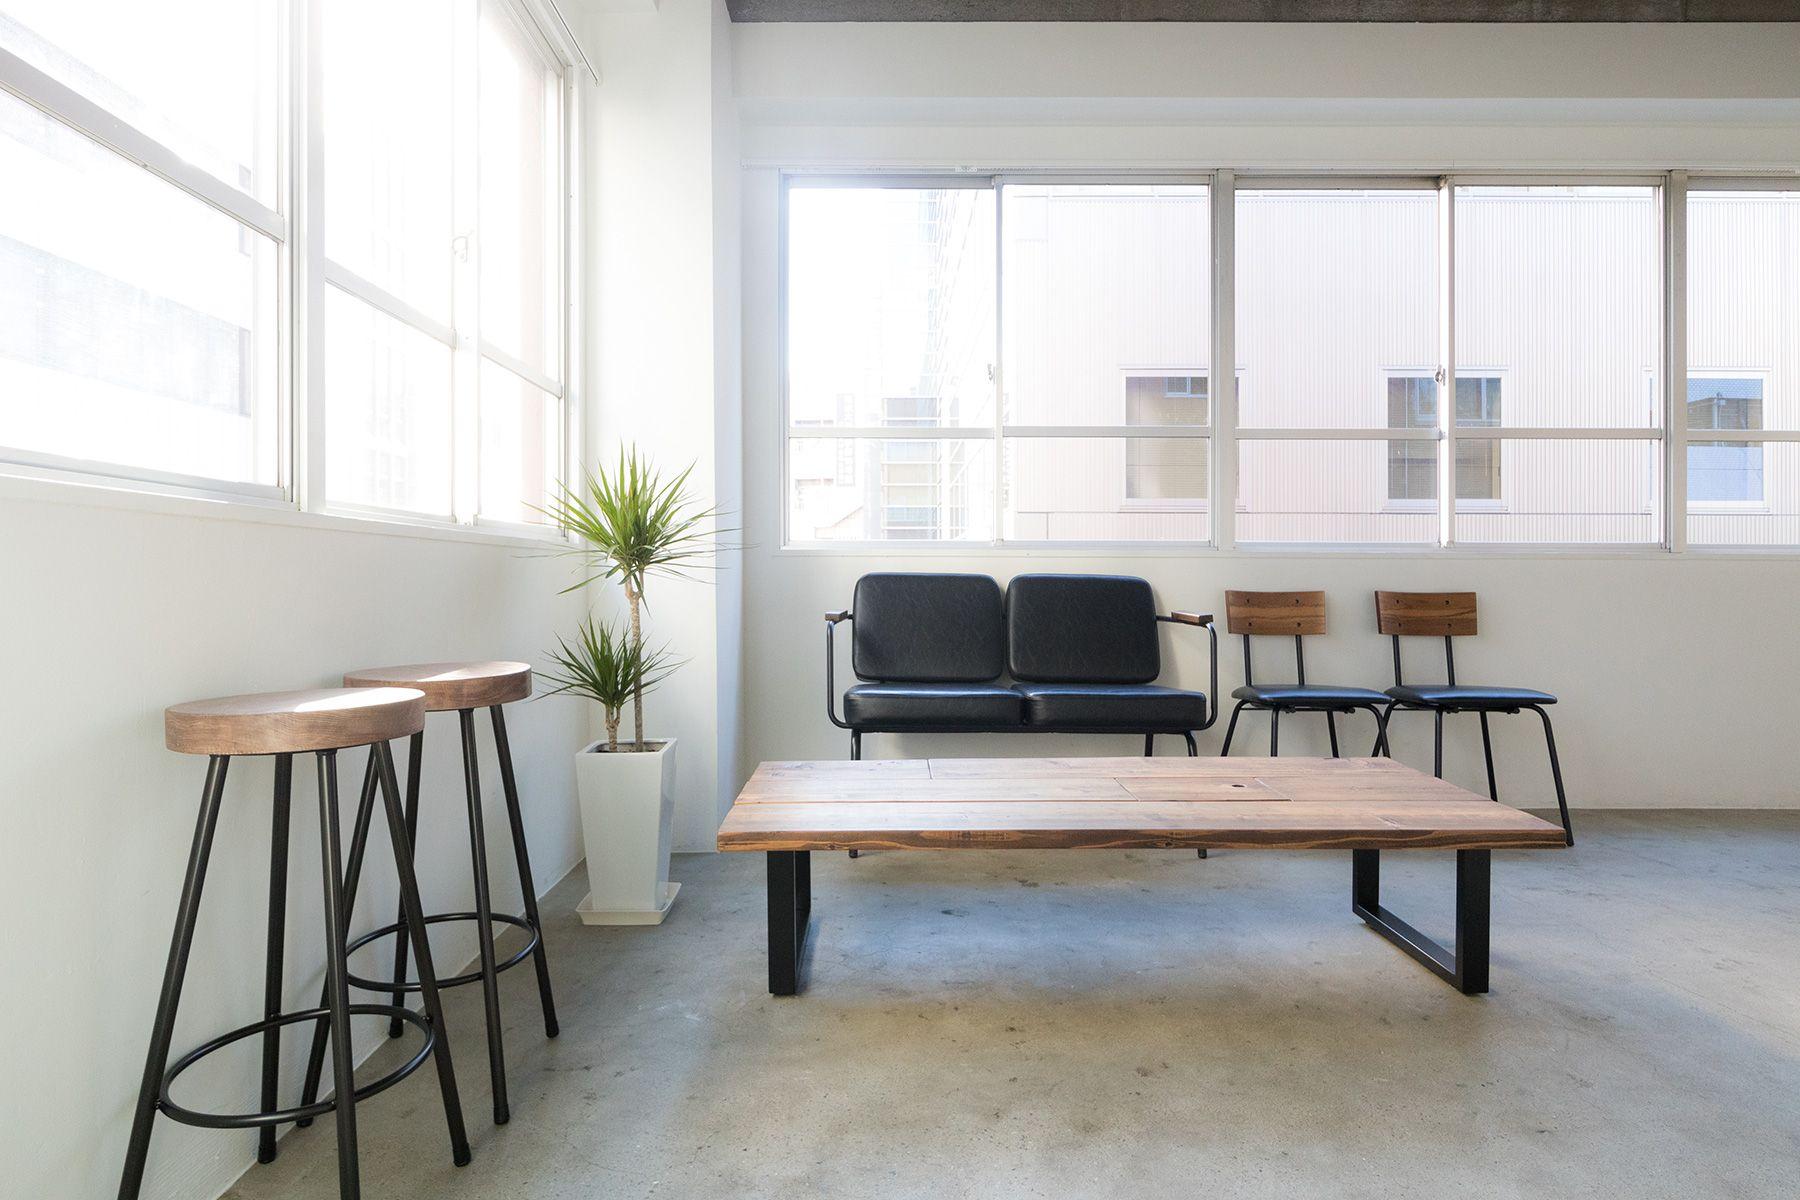 Studio Serato 水道橋 (スタジオセラート水道橋)撮影の良いアクセントとなる家具